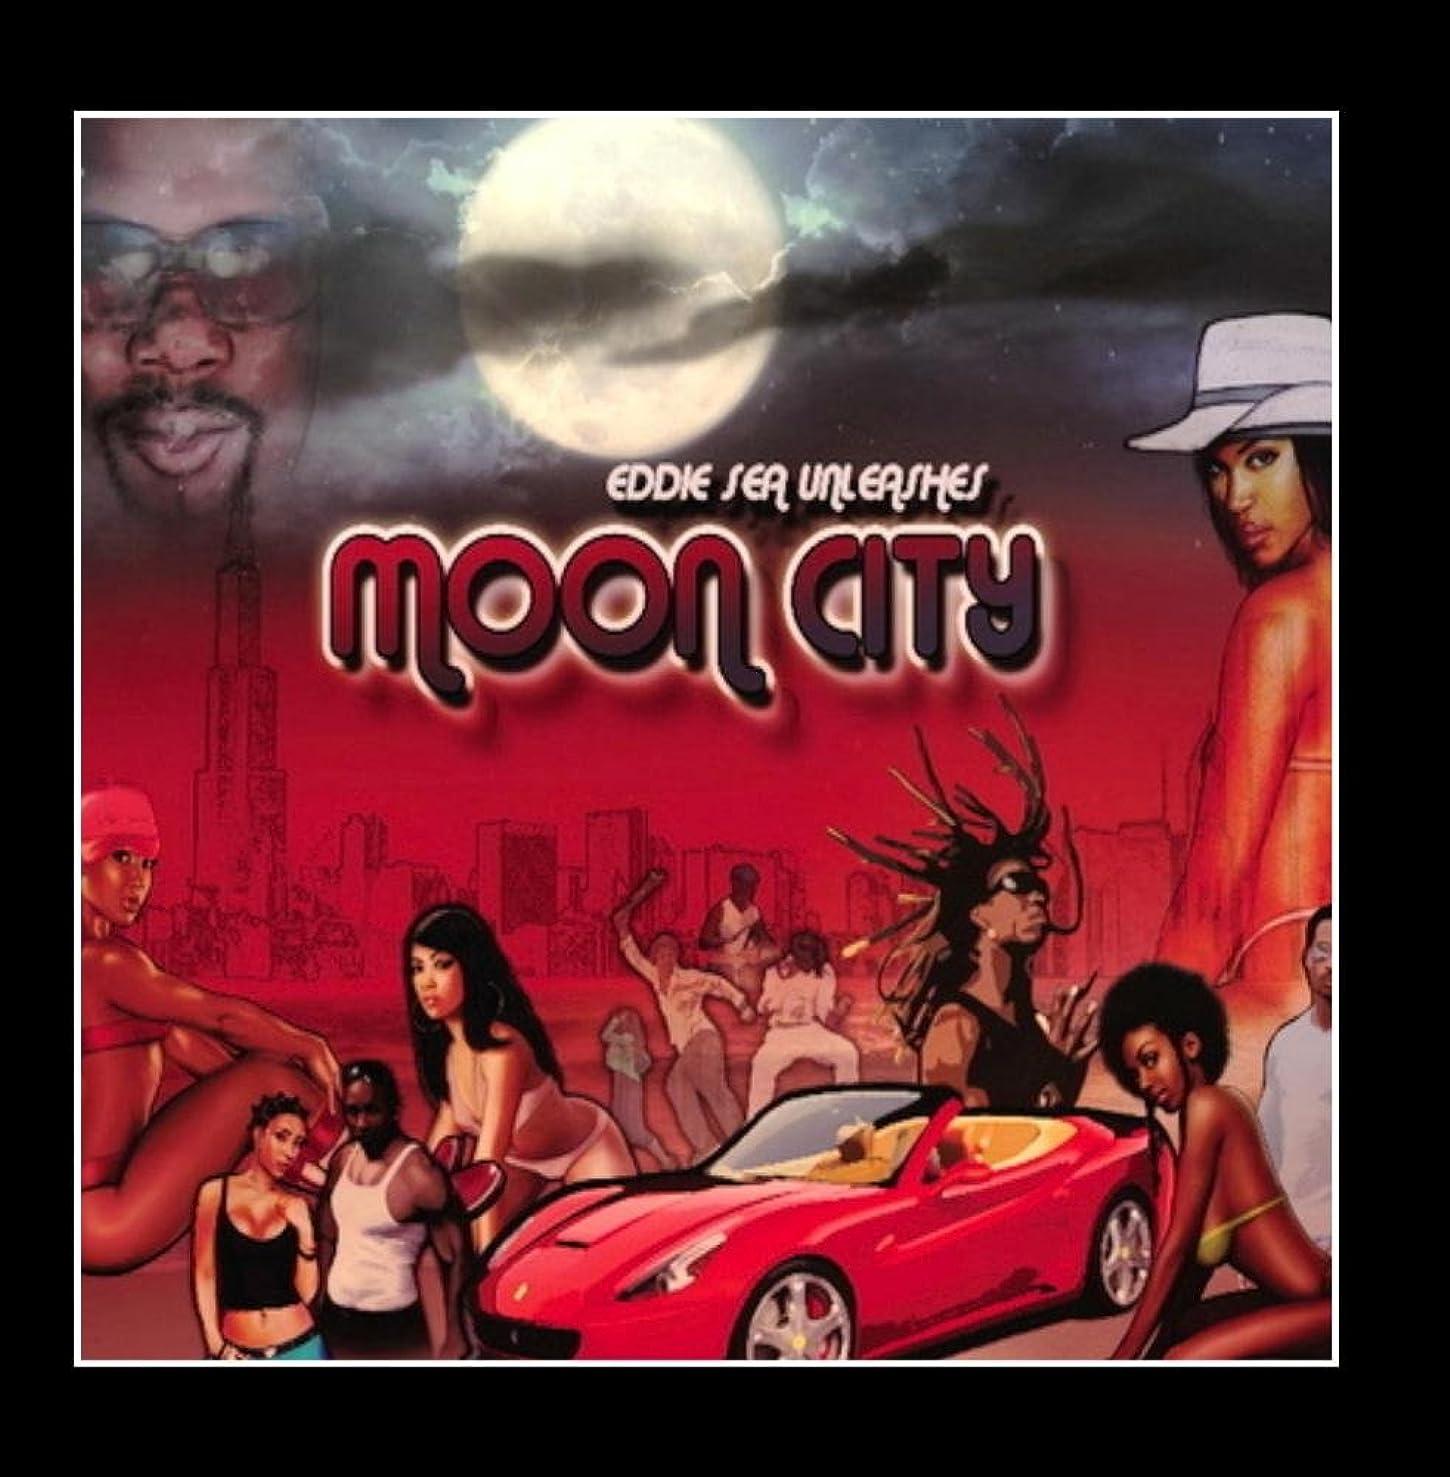 Moon City Instrumentals